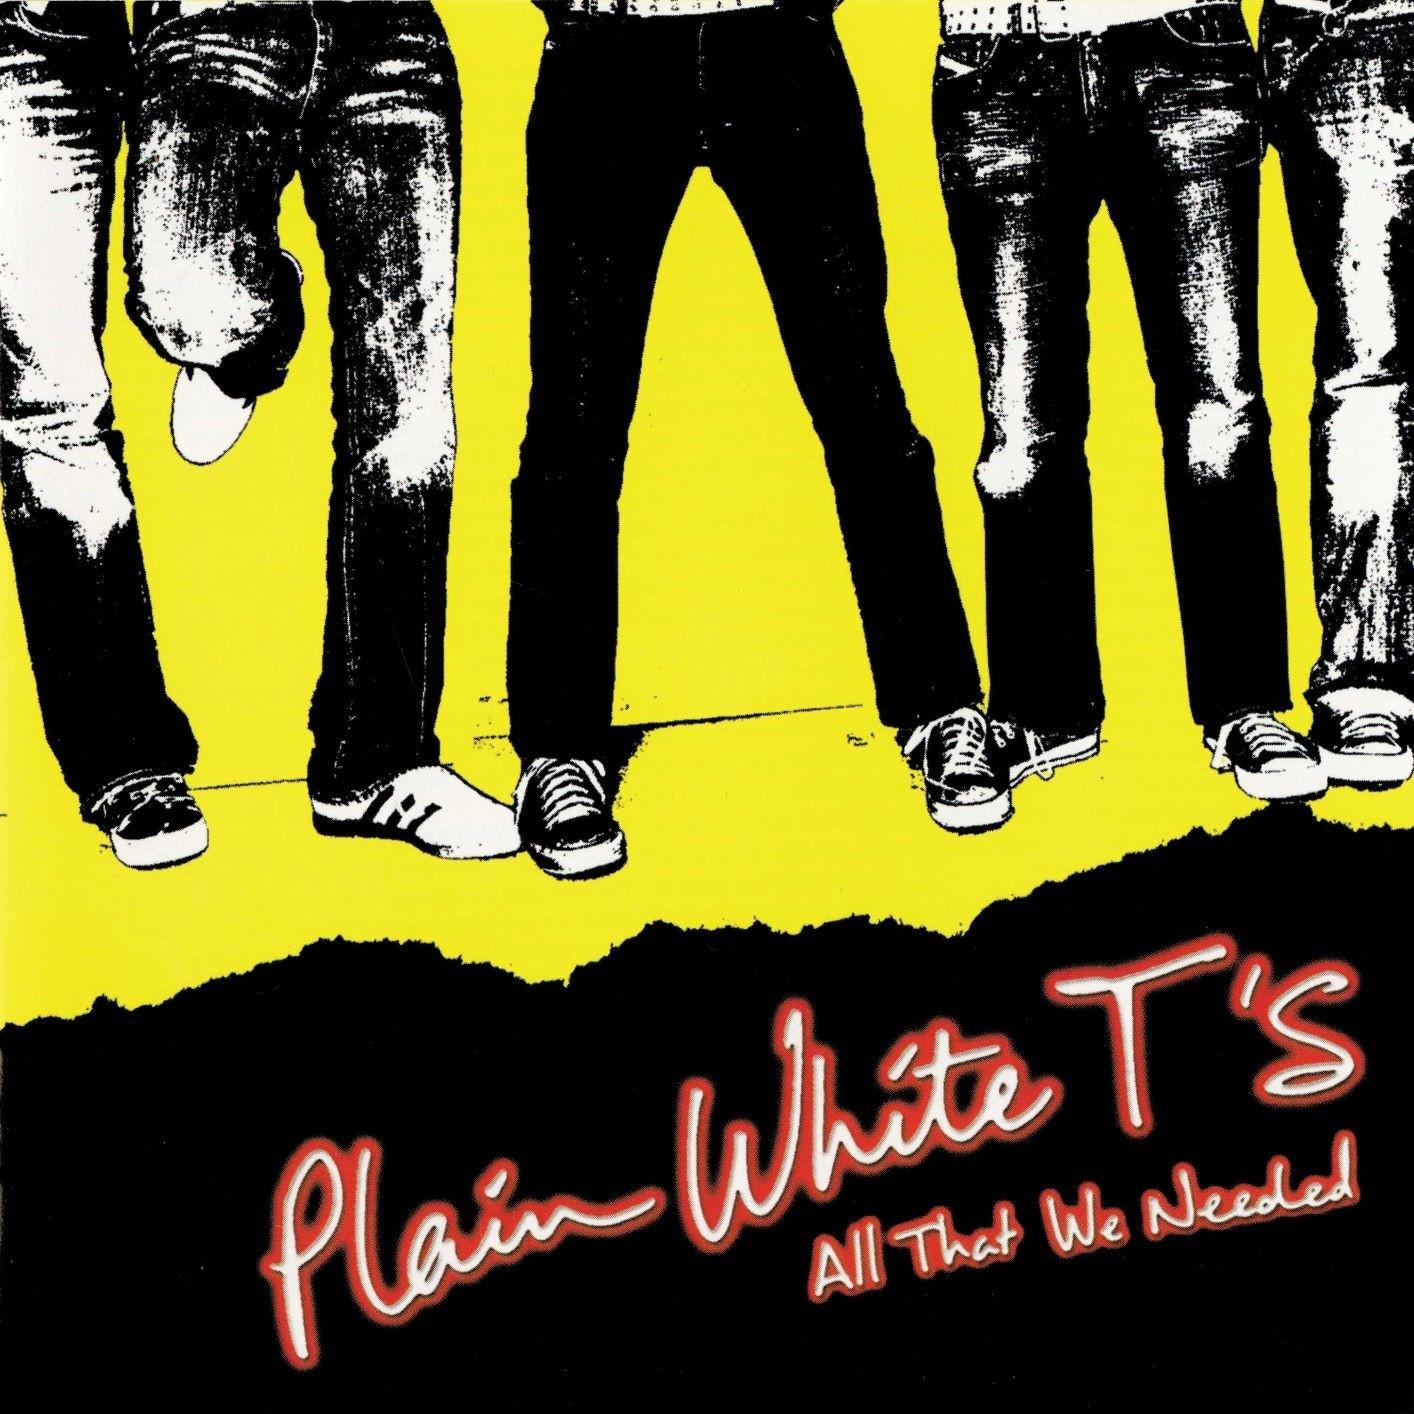 Plain White T's - All That We Needed (Red) Vinyl LP